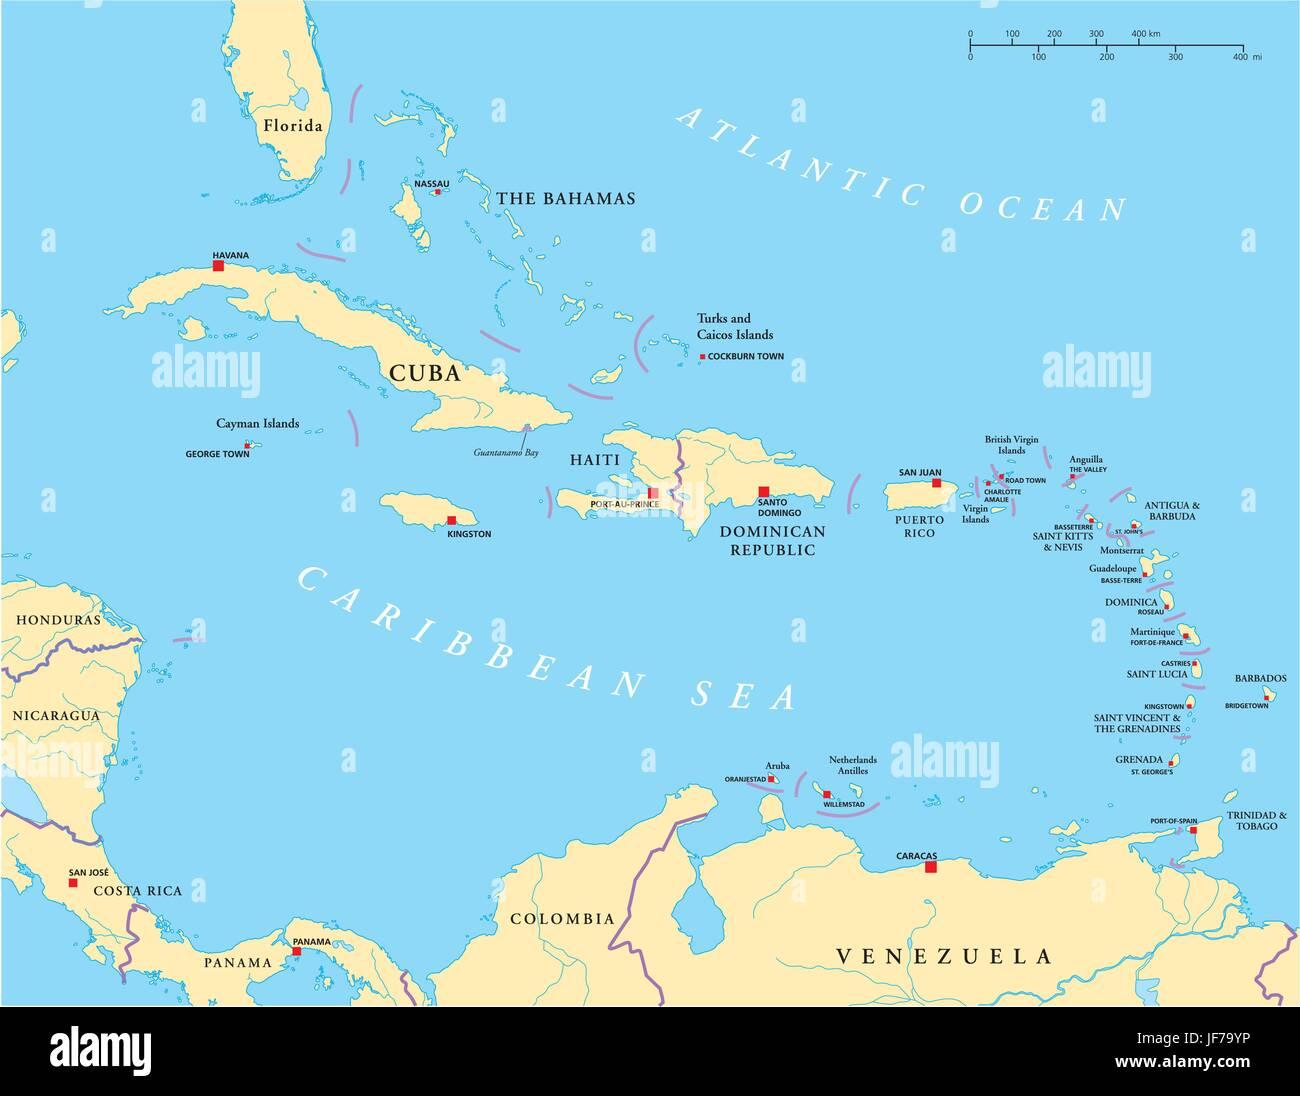 Carte Cuba Monde.Cuba Antilles Caraibes Carte Atlas Carte Du Monde De